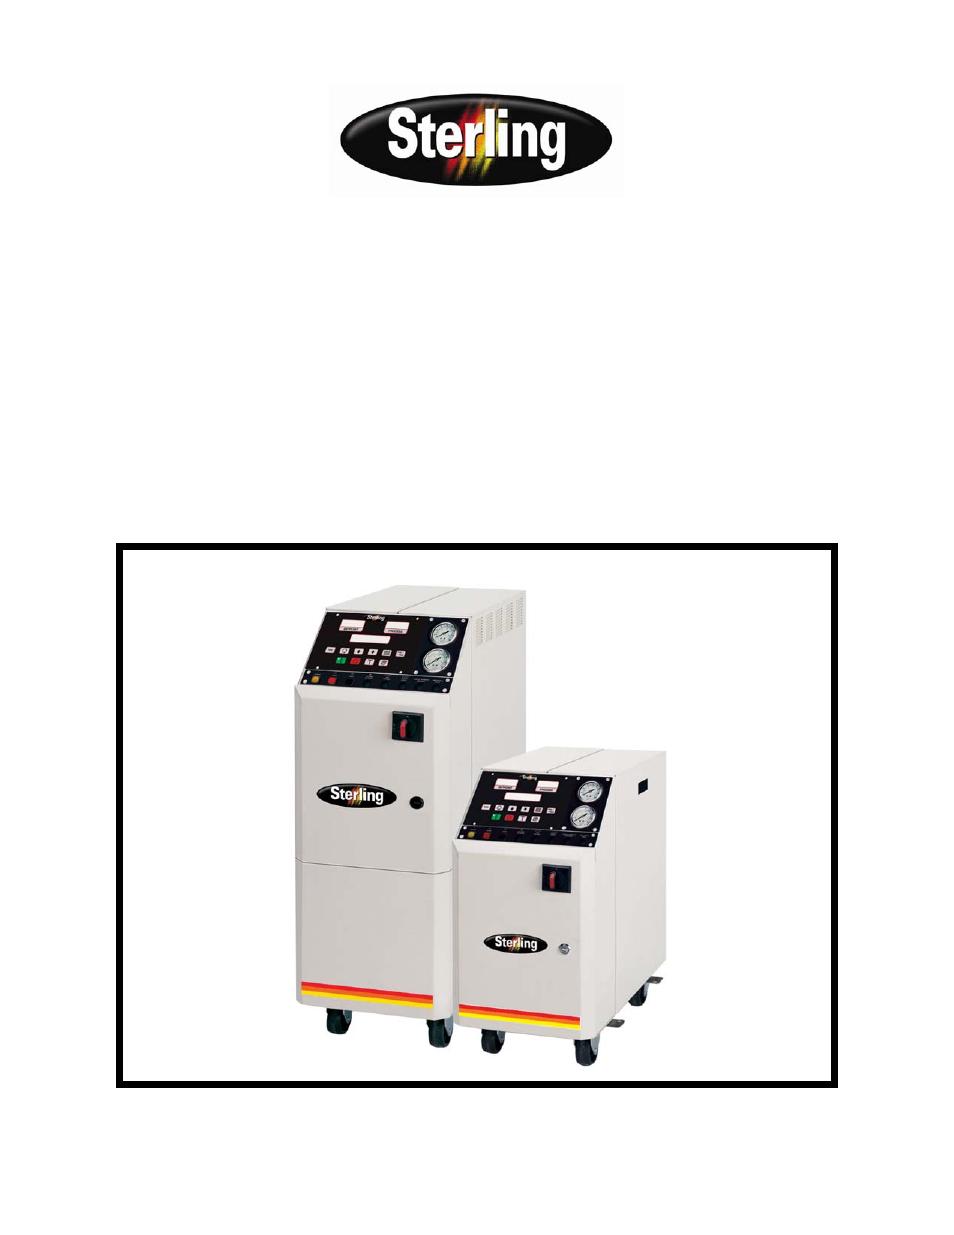 Sterlco Royal Series Compact Temperature Control Unit User